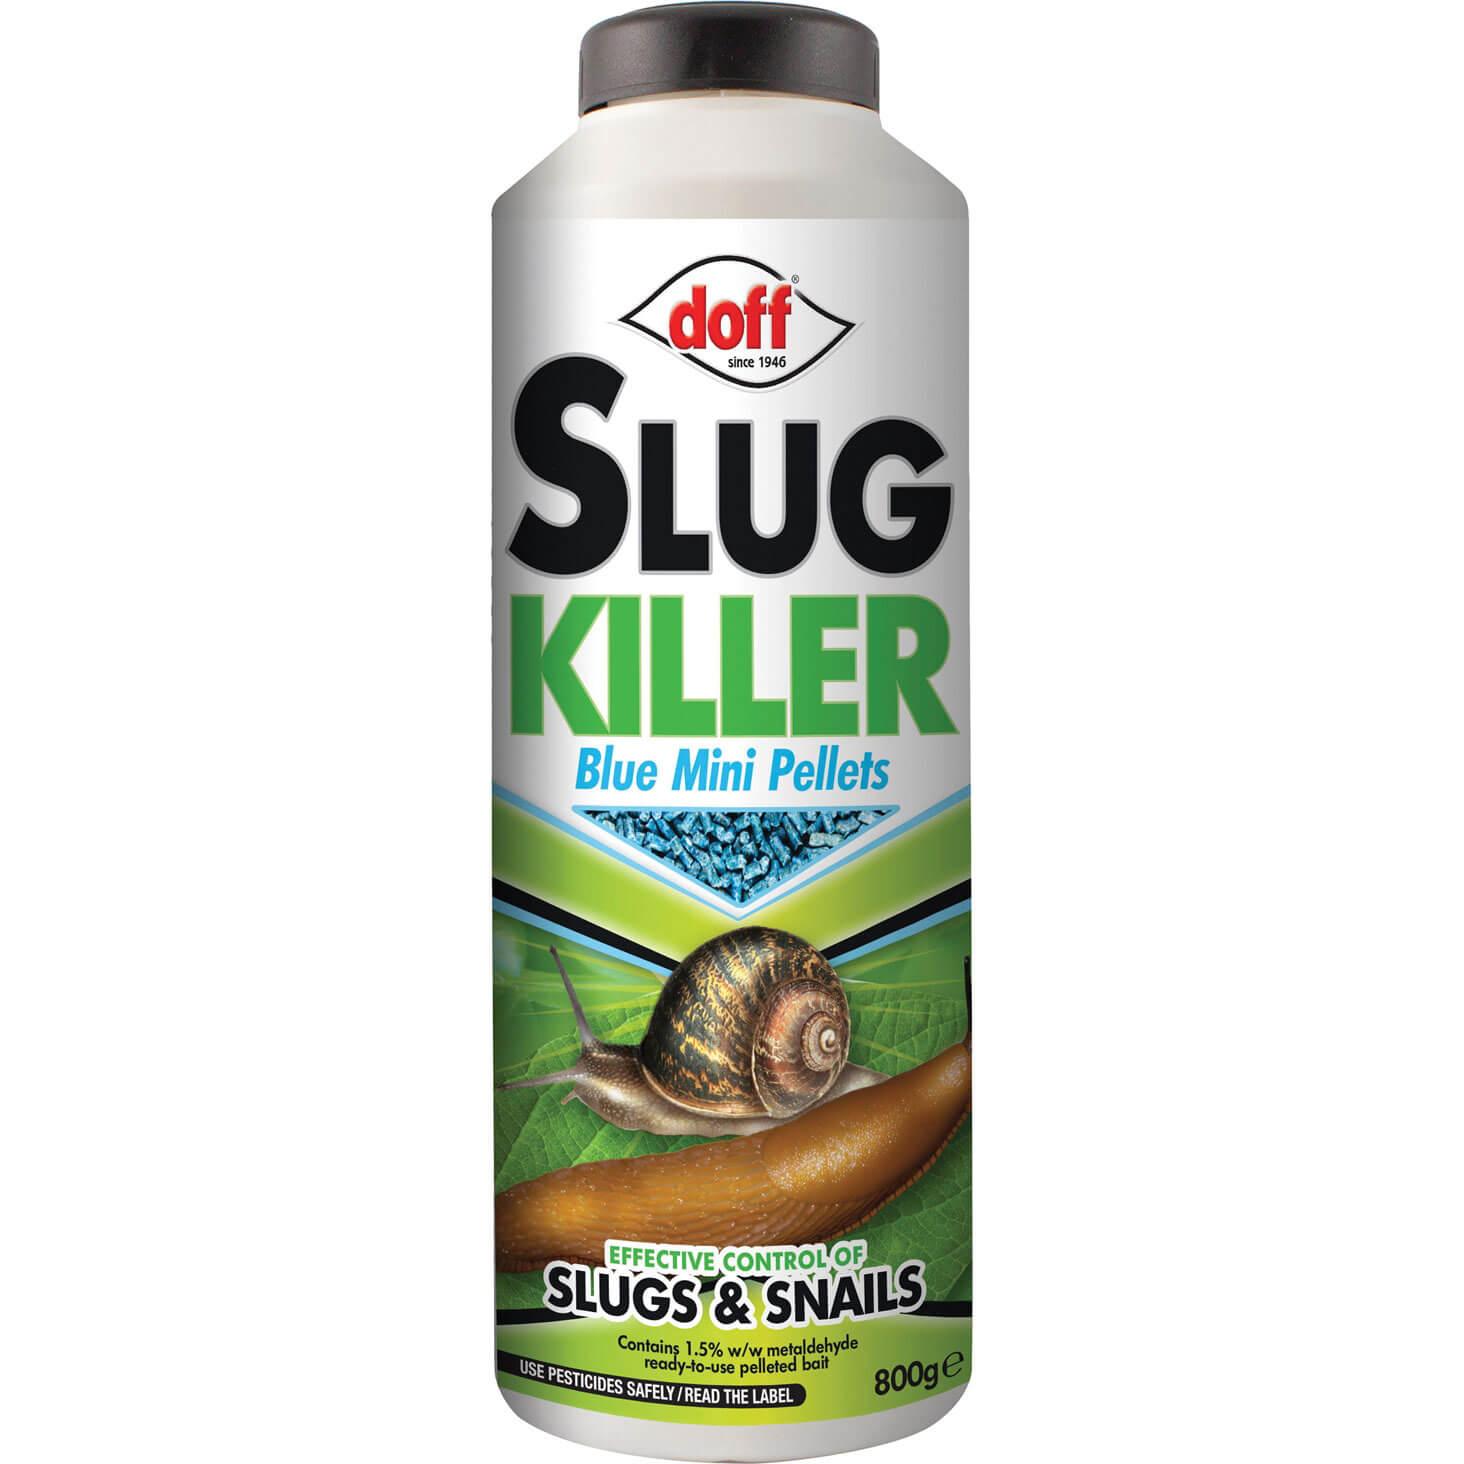 Image of Doff Slug Killer Pellets 800g